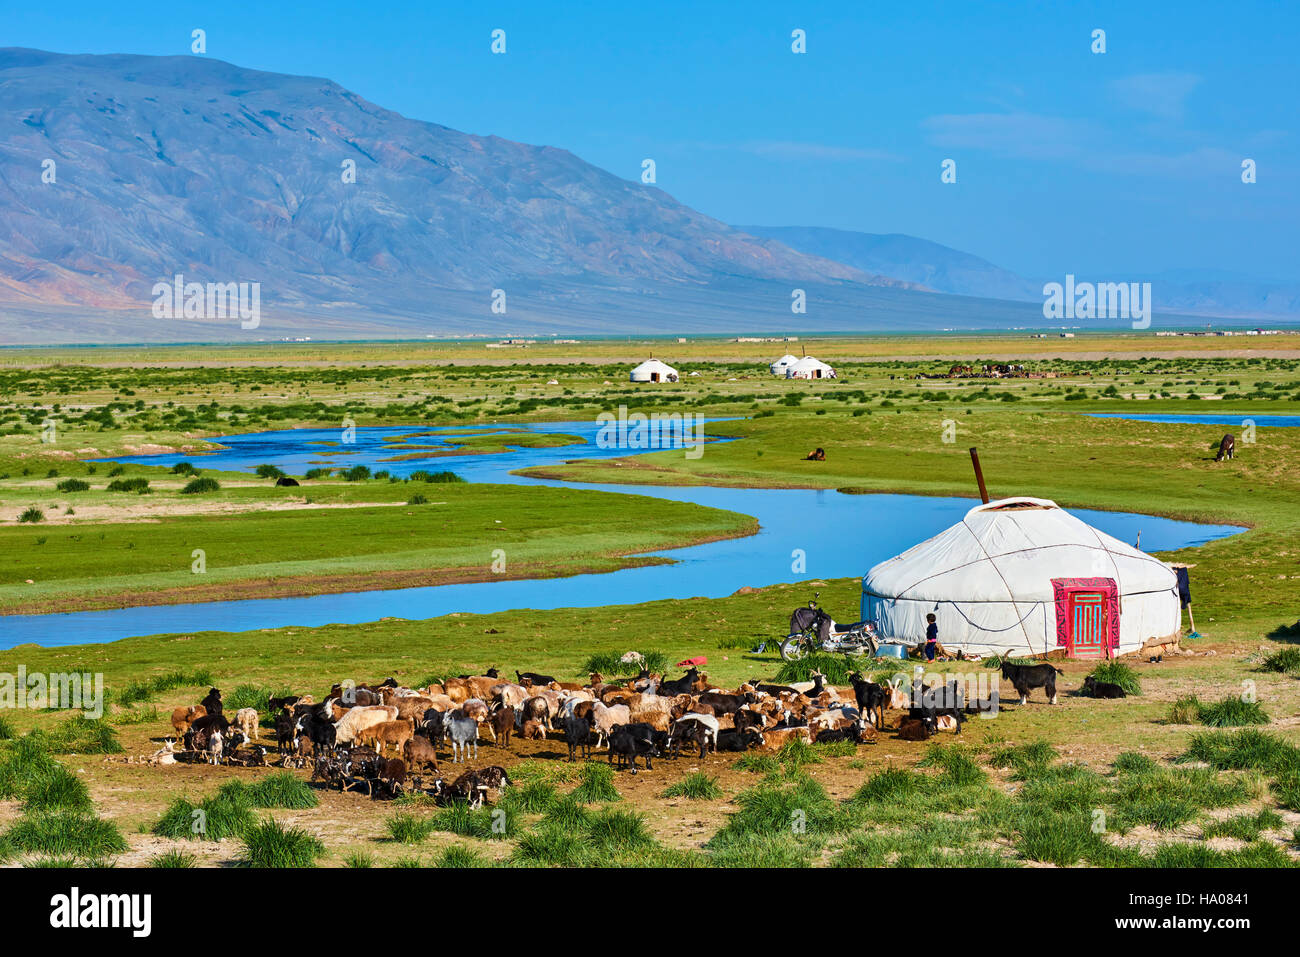 Mongolia, Bayan-Ulgii provincia, oeste de Mongolia, campamento nómada del pueblo kazajo en la estepa Foto de stock